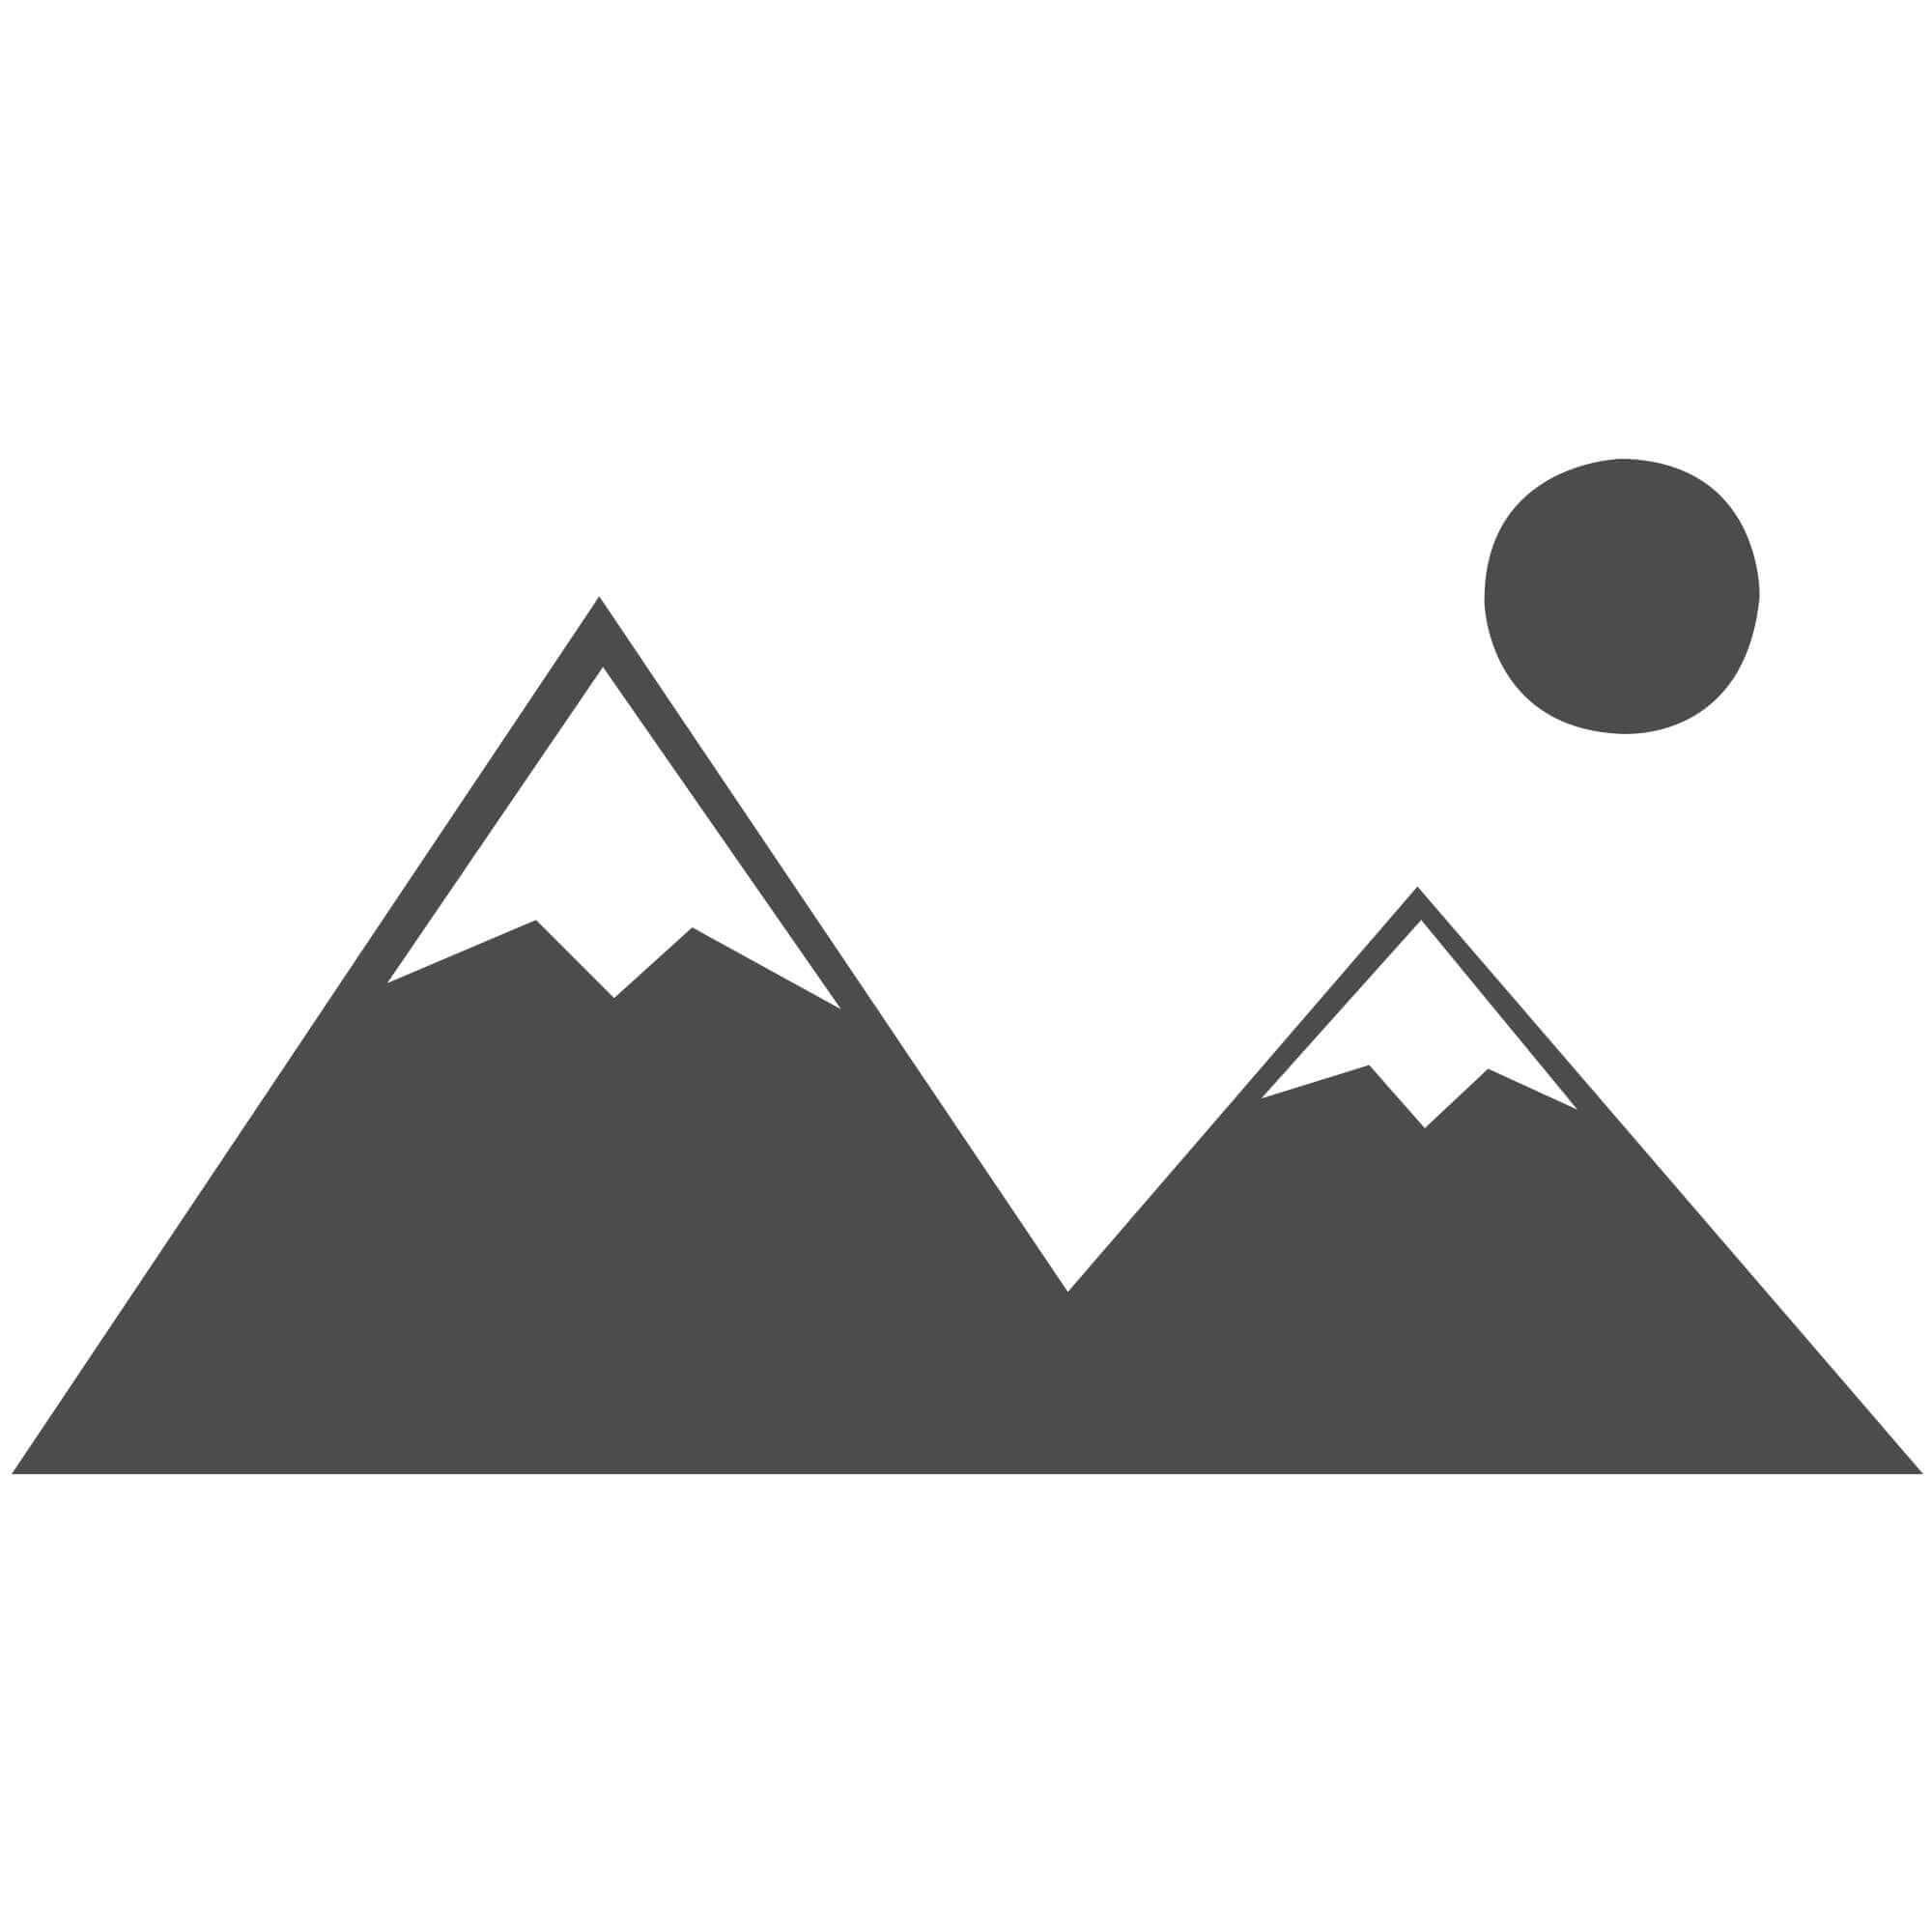 "Kelim Flat-weave Rug - Charcoal-70 x 140 cm (2'3"" x 4'7"")"